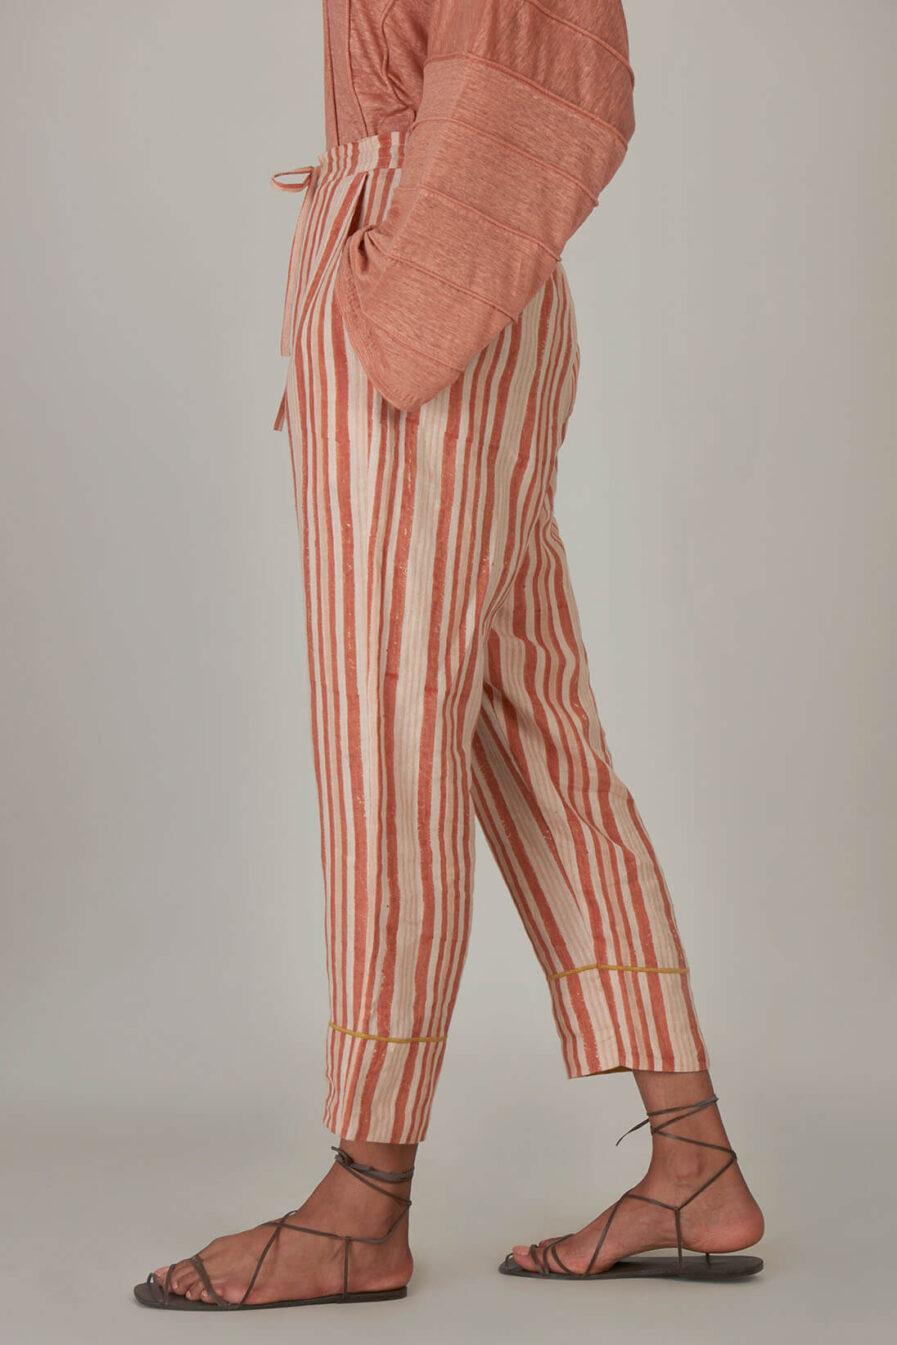 Anavila Peach Block Printed Stripes Organic Linen Trouser